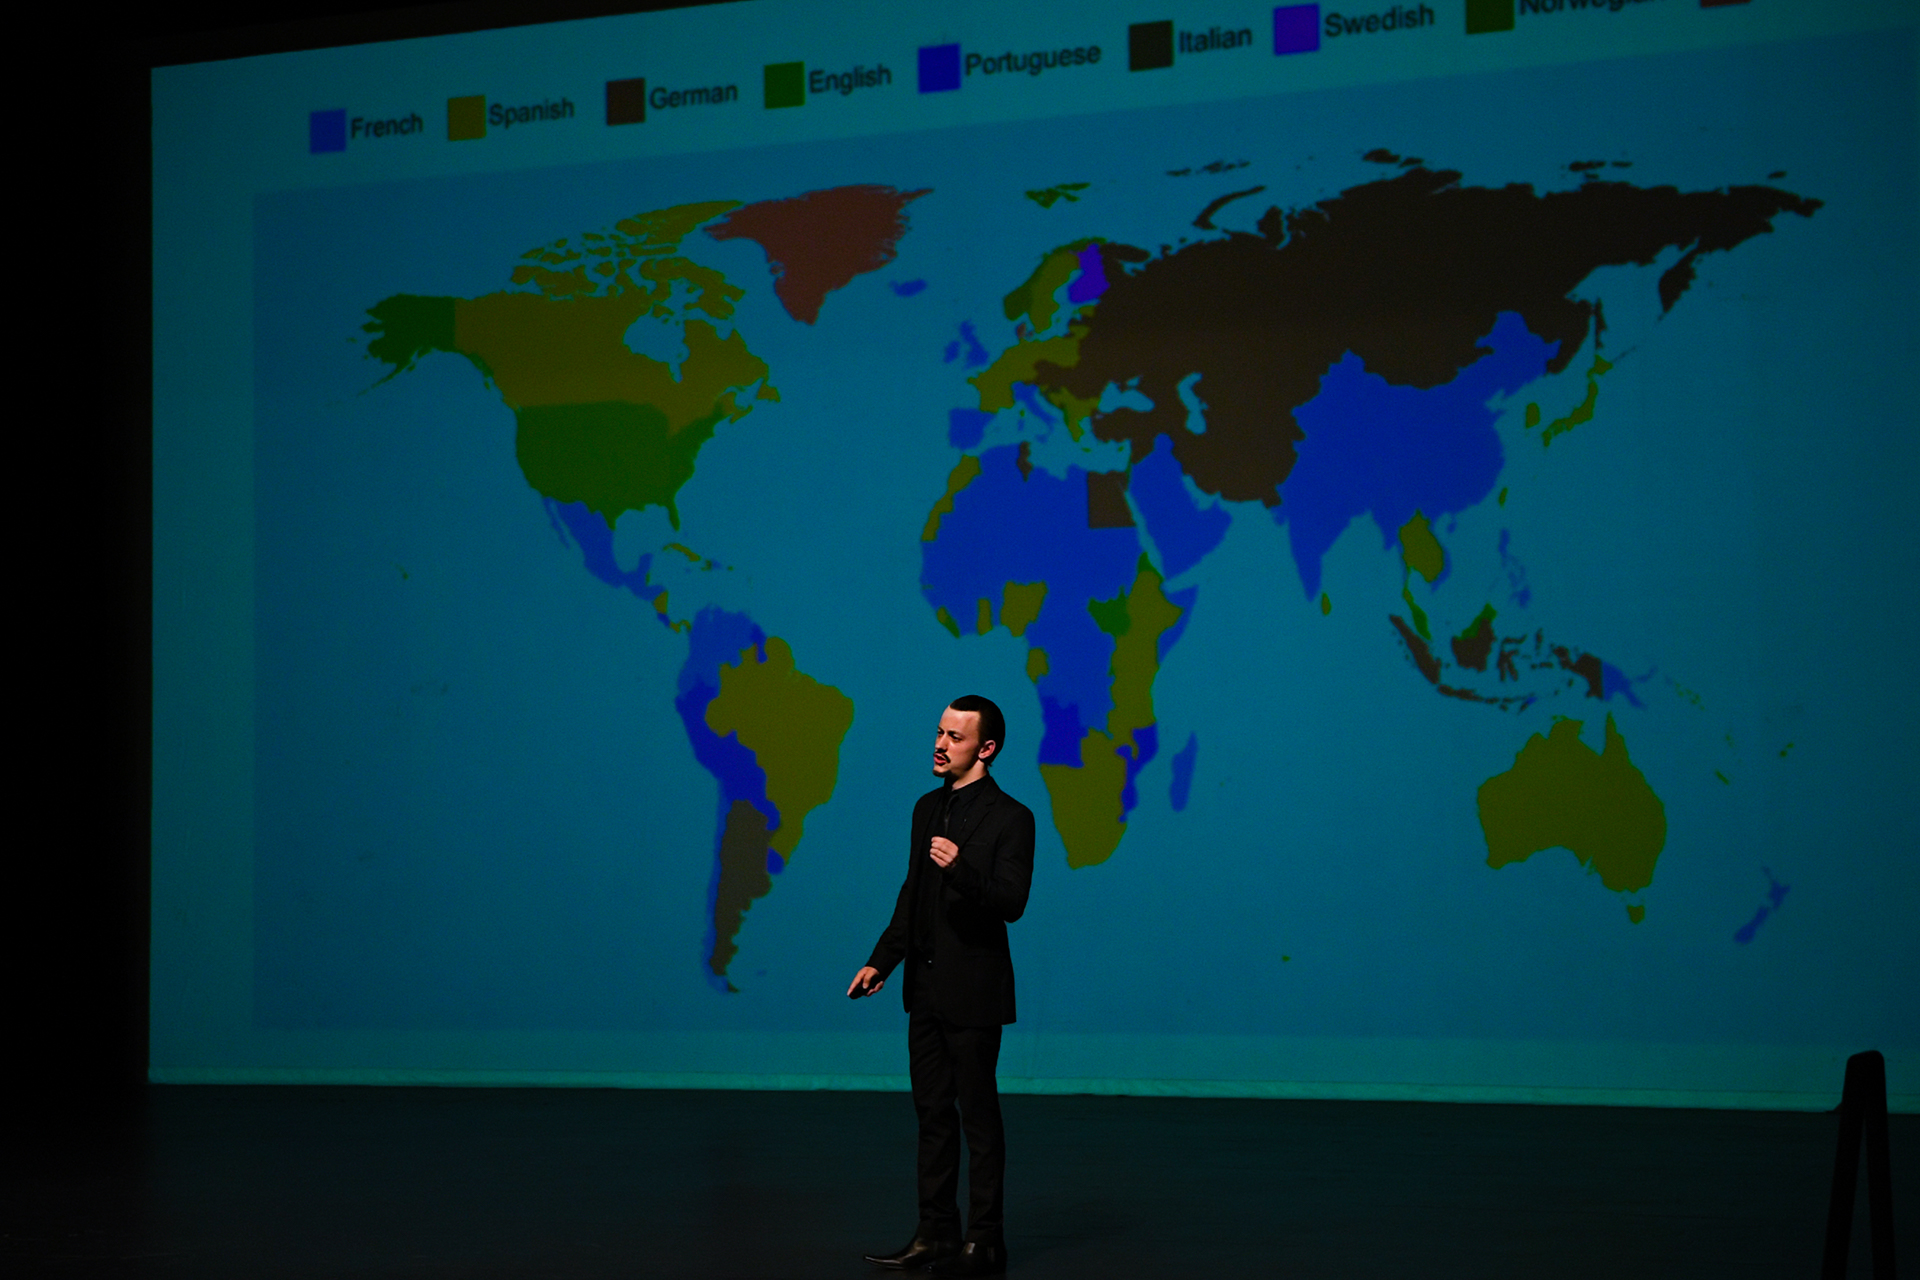 Jack Morgan gives a talk in 2018